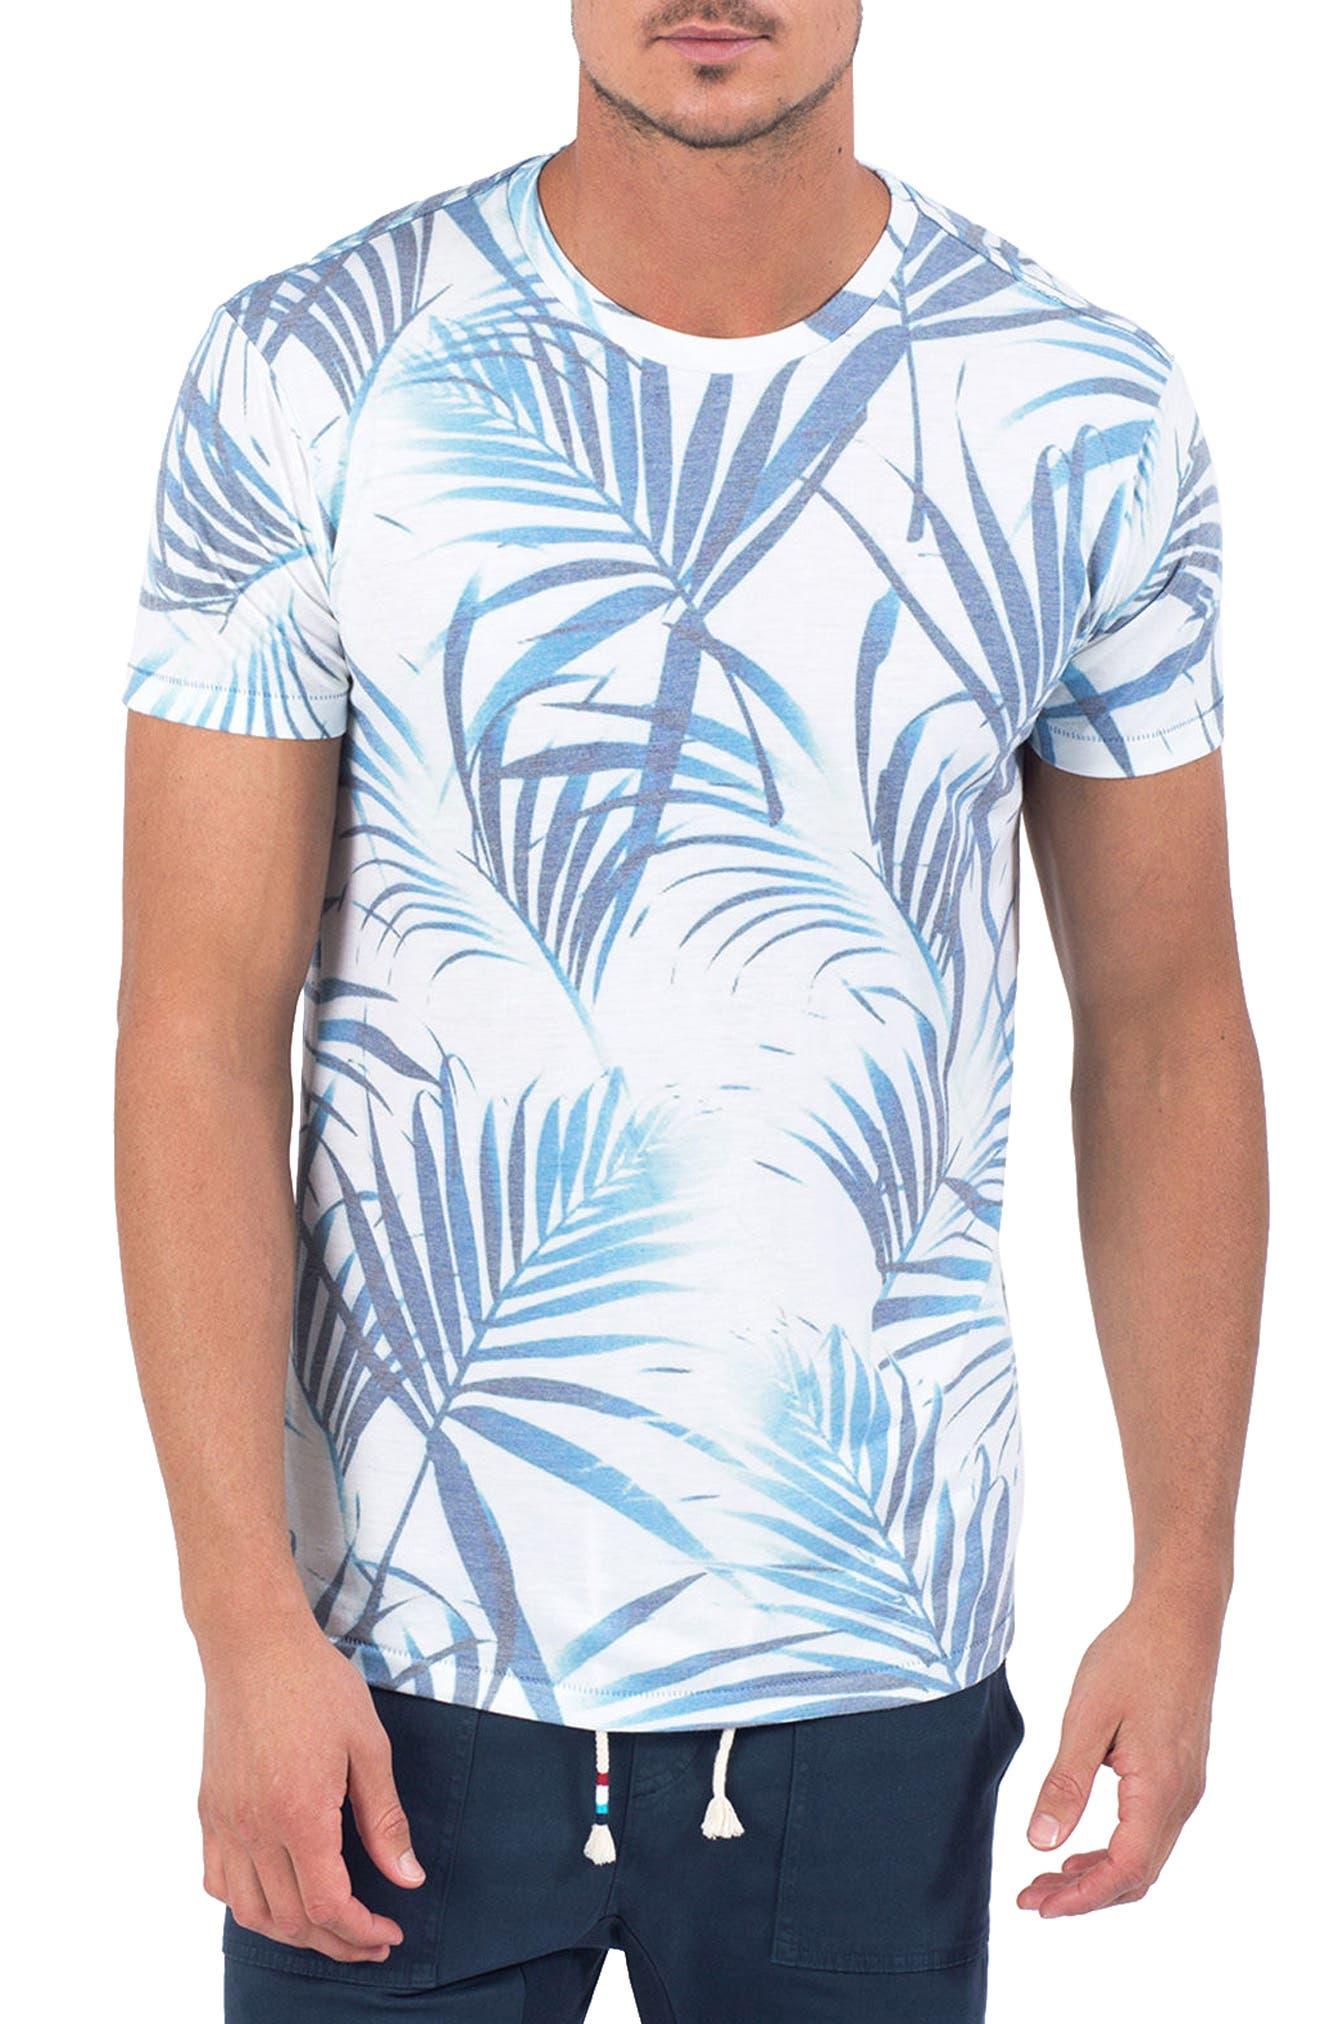 Las Brisas Graphic T-Shirt,                         Main,                         color, 100